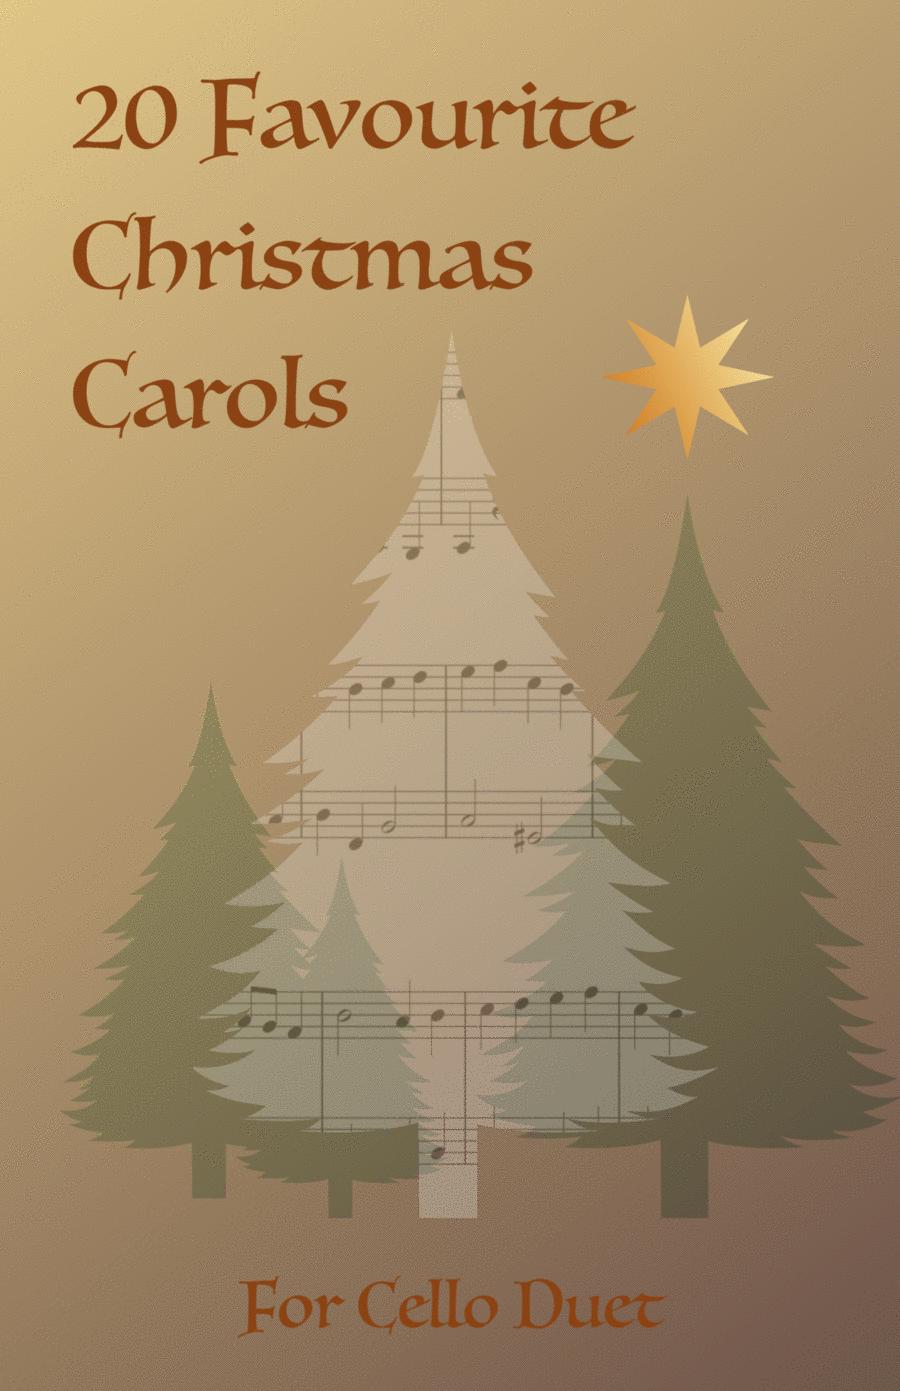 20 Favourite Christmas Carols for Cello Duet